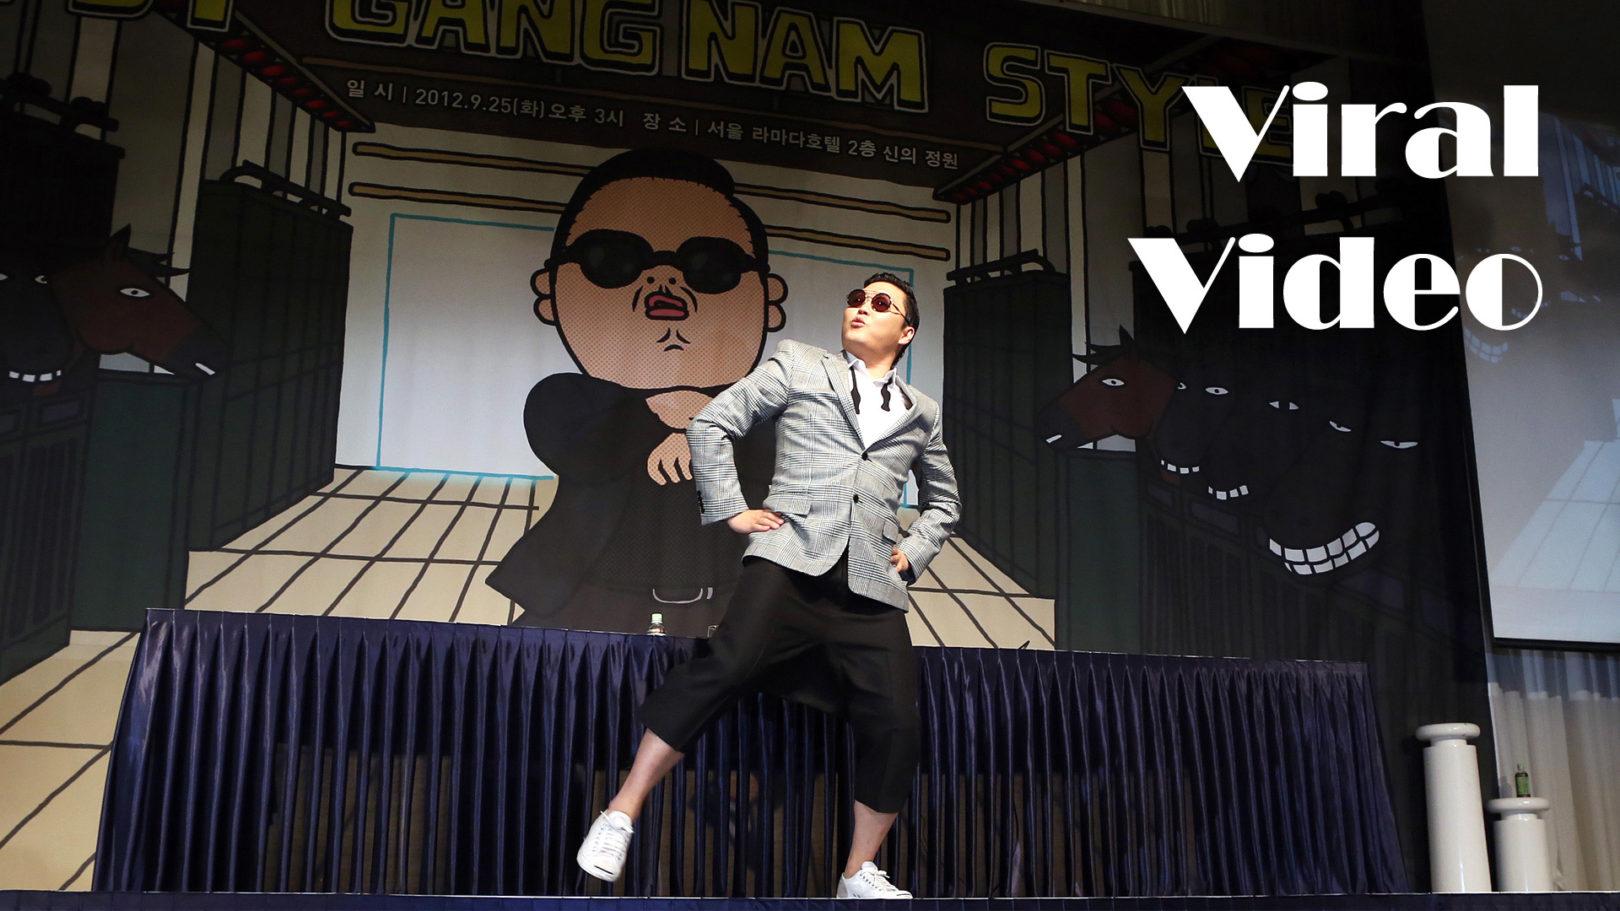 viral-video-making